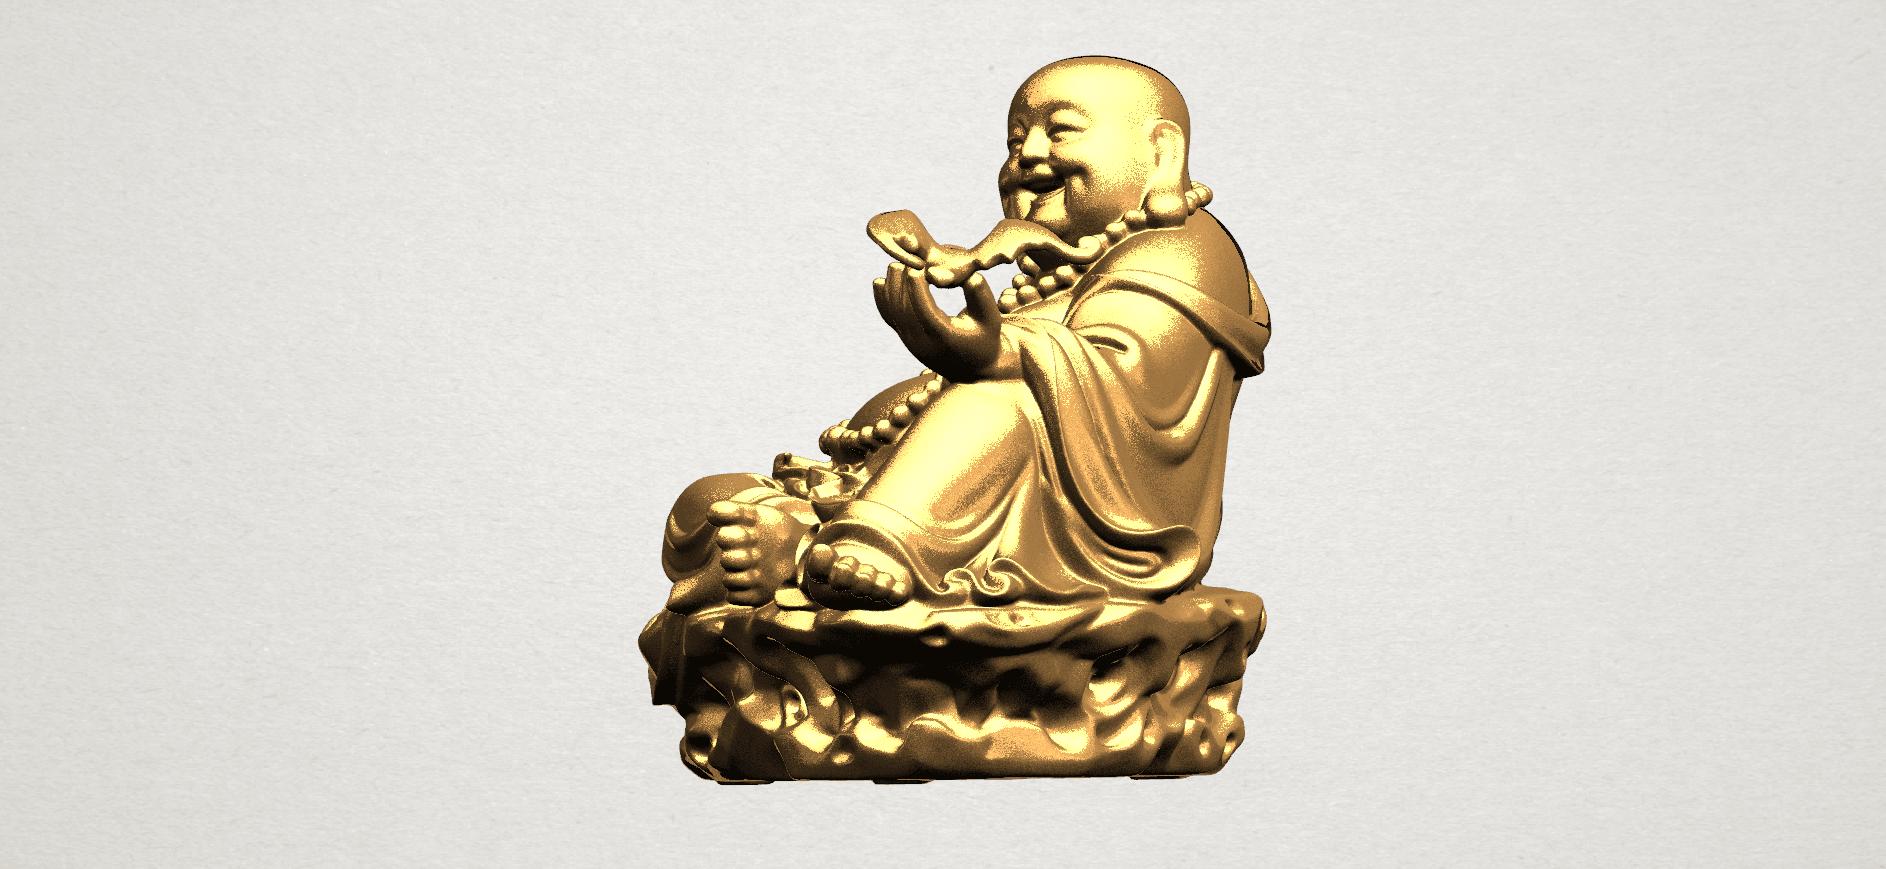 Metteyya Buddha 06 - A02.png Download free STL file Metteyya Buddha 06 • 3D print model, GeorgesNikkei